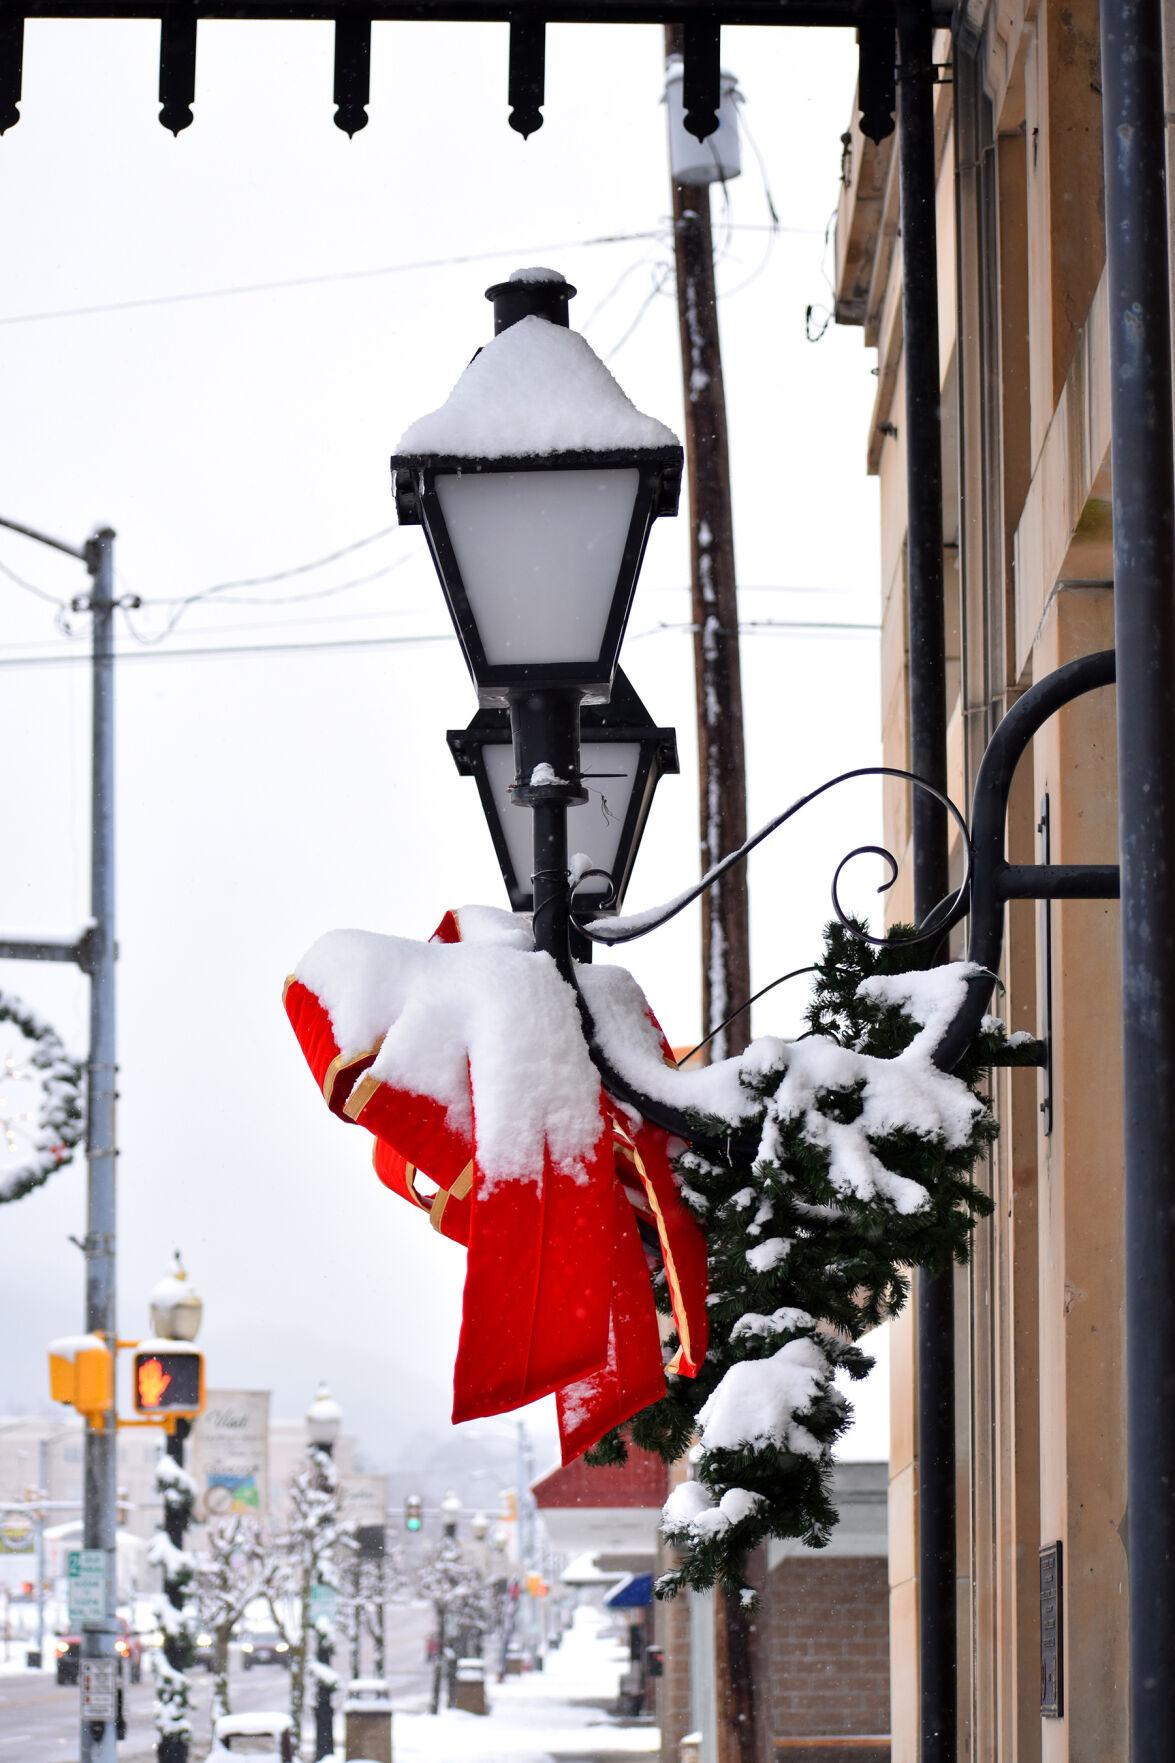 Snow day, Jan. 8, 2021 - Lantern